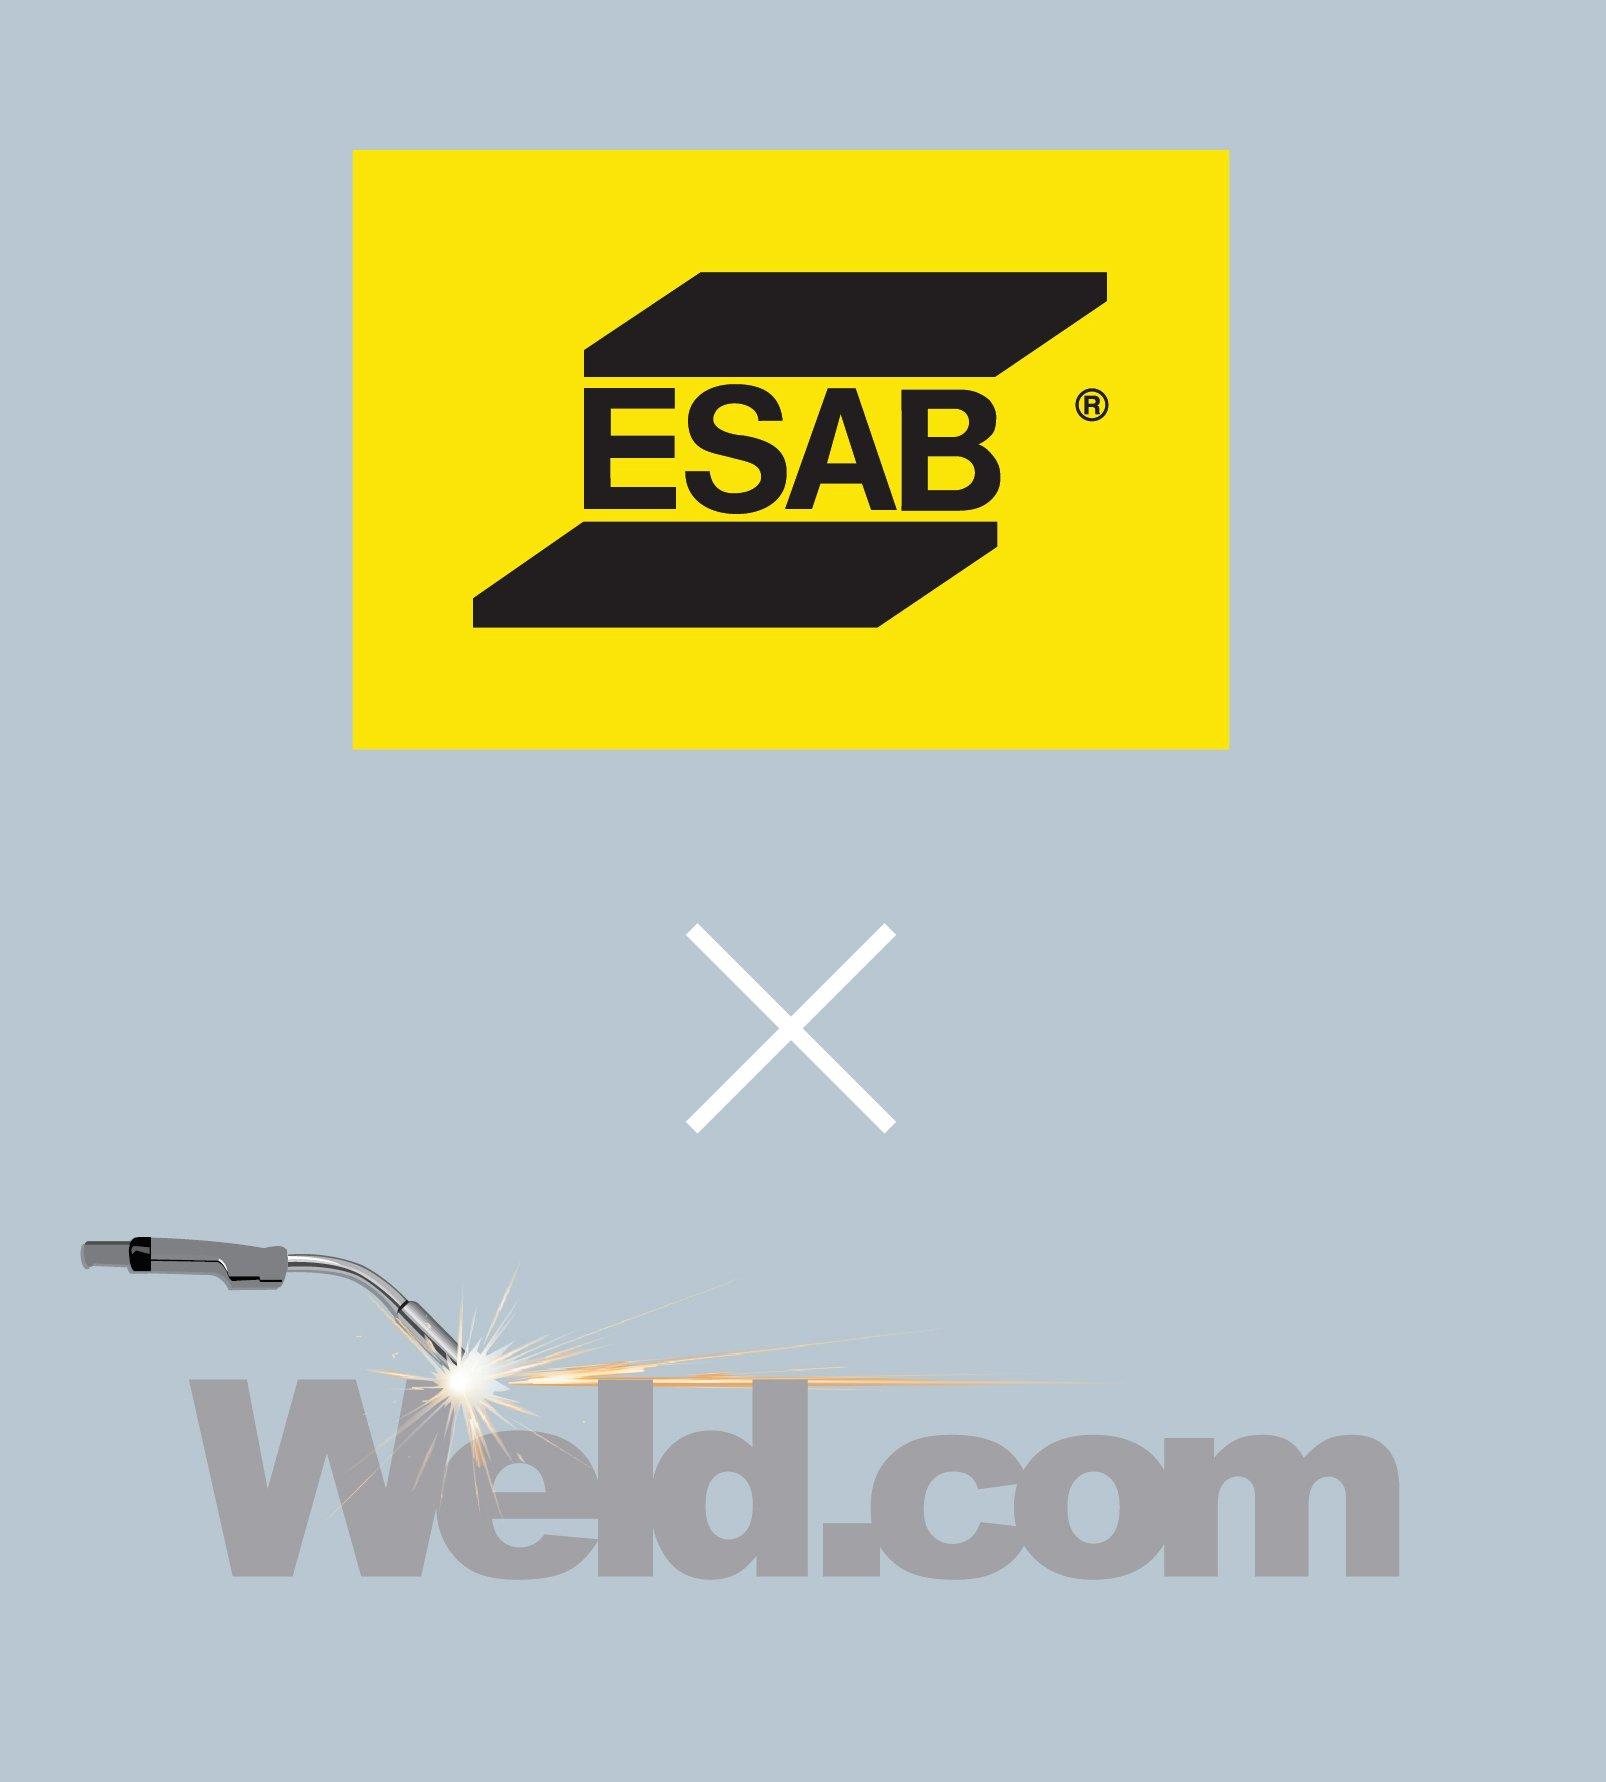 ESAB-Weld.com_vert_logo-resized